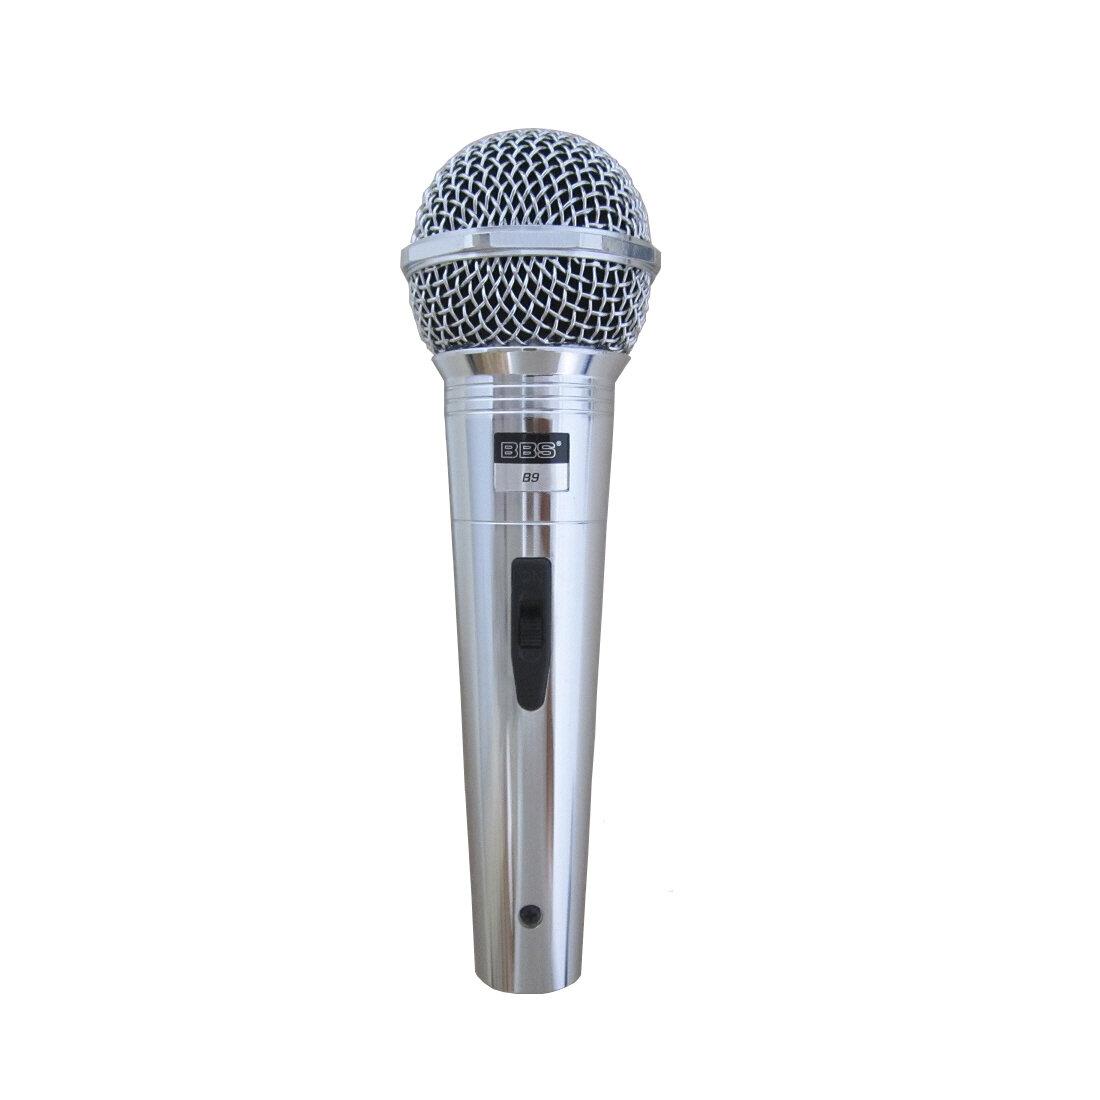 Micro Karaoke BBS B9